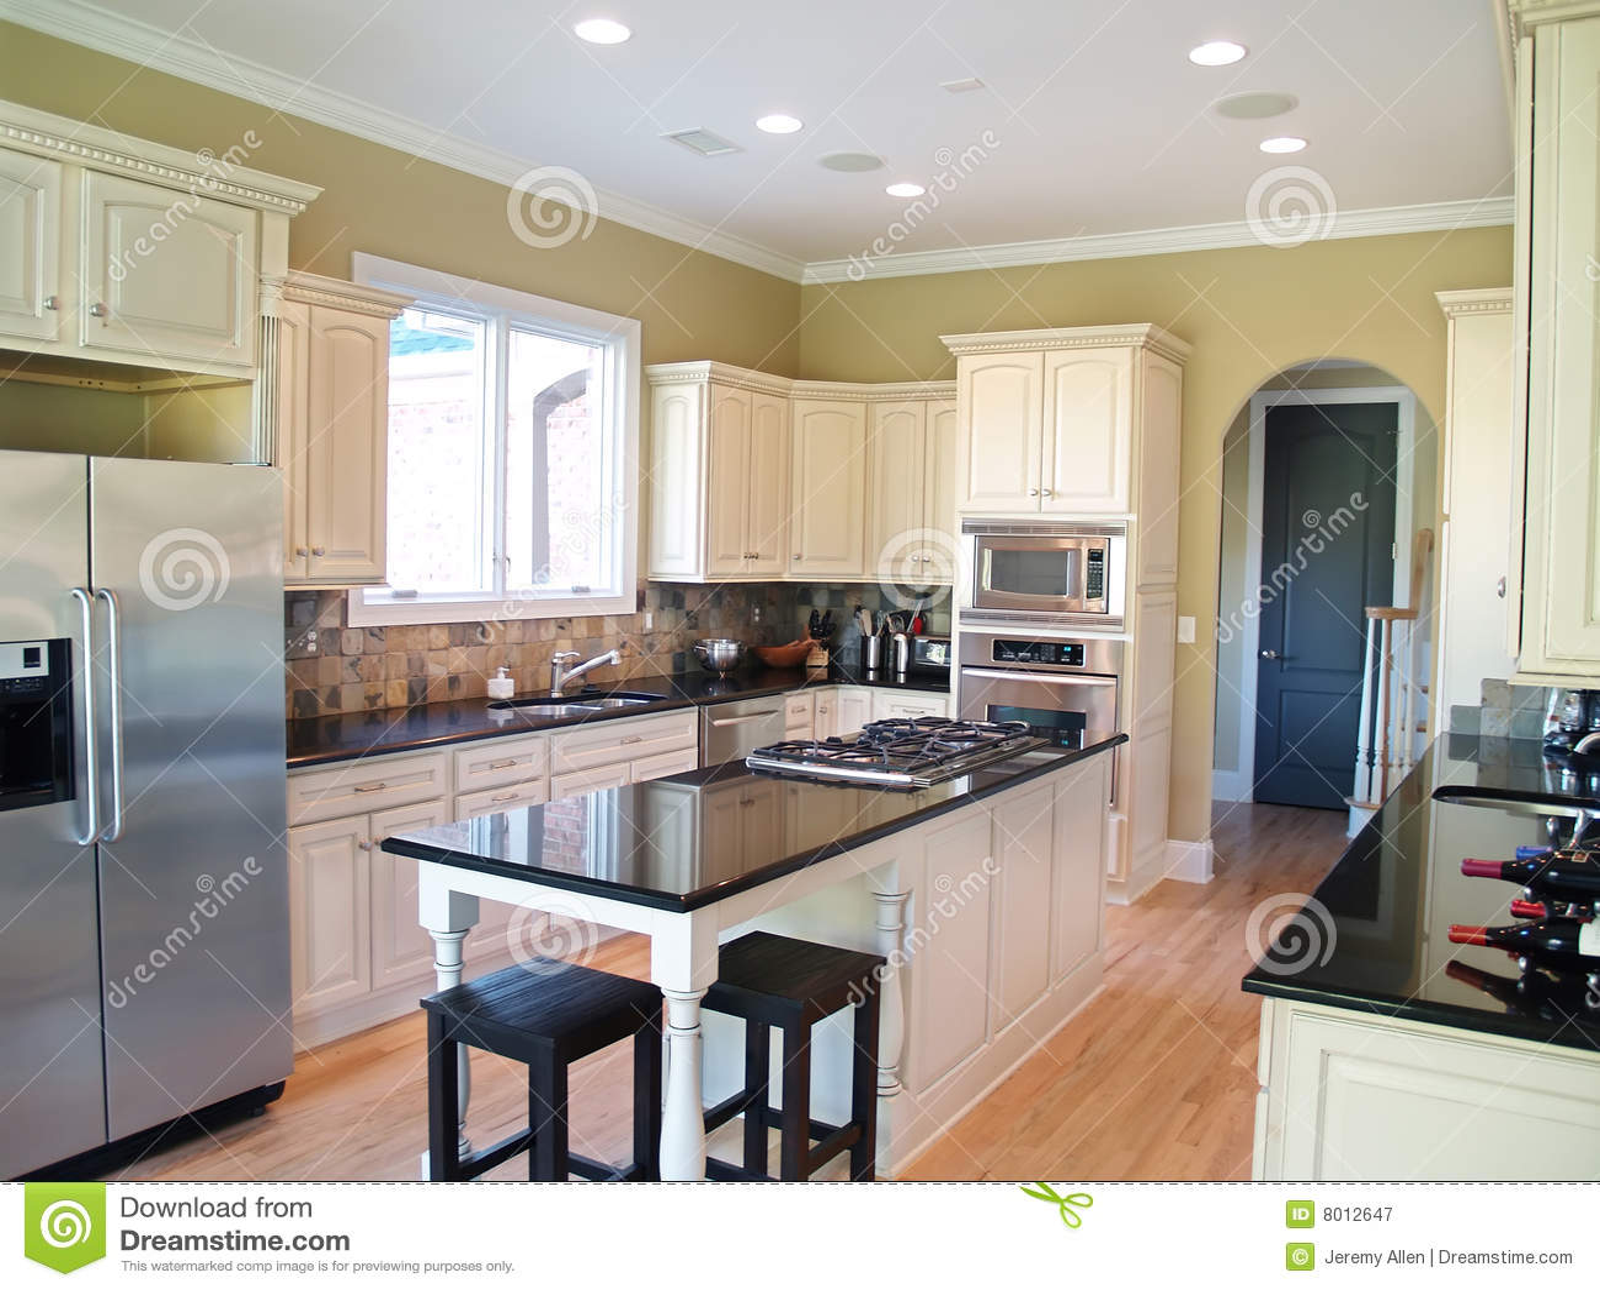 Idees de comptoir cuisine moderne for Comptoir cuisine americaine